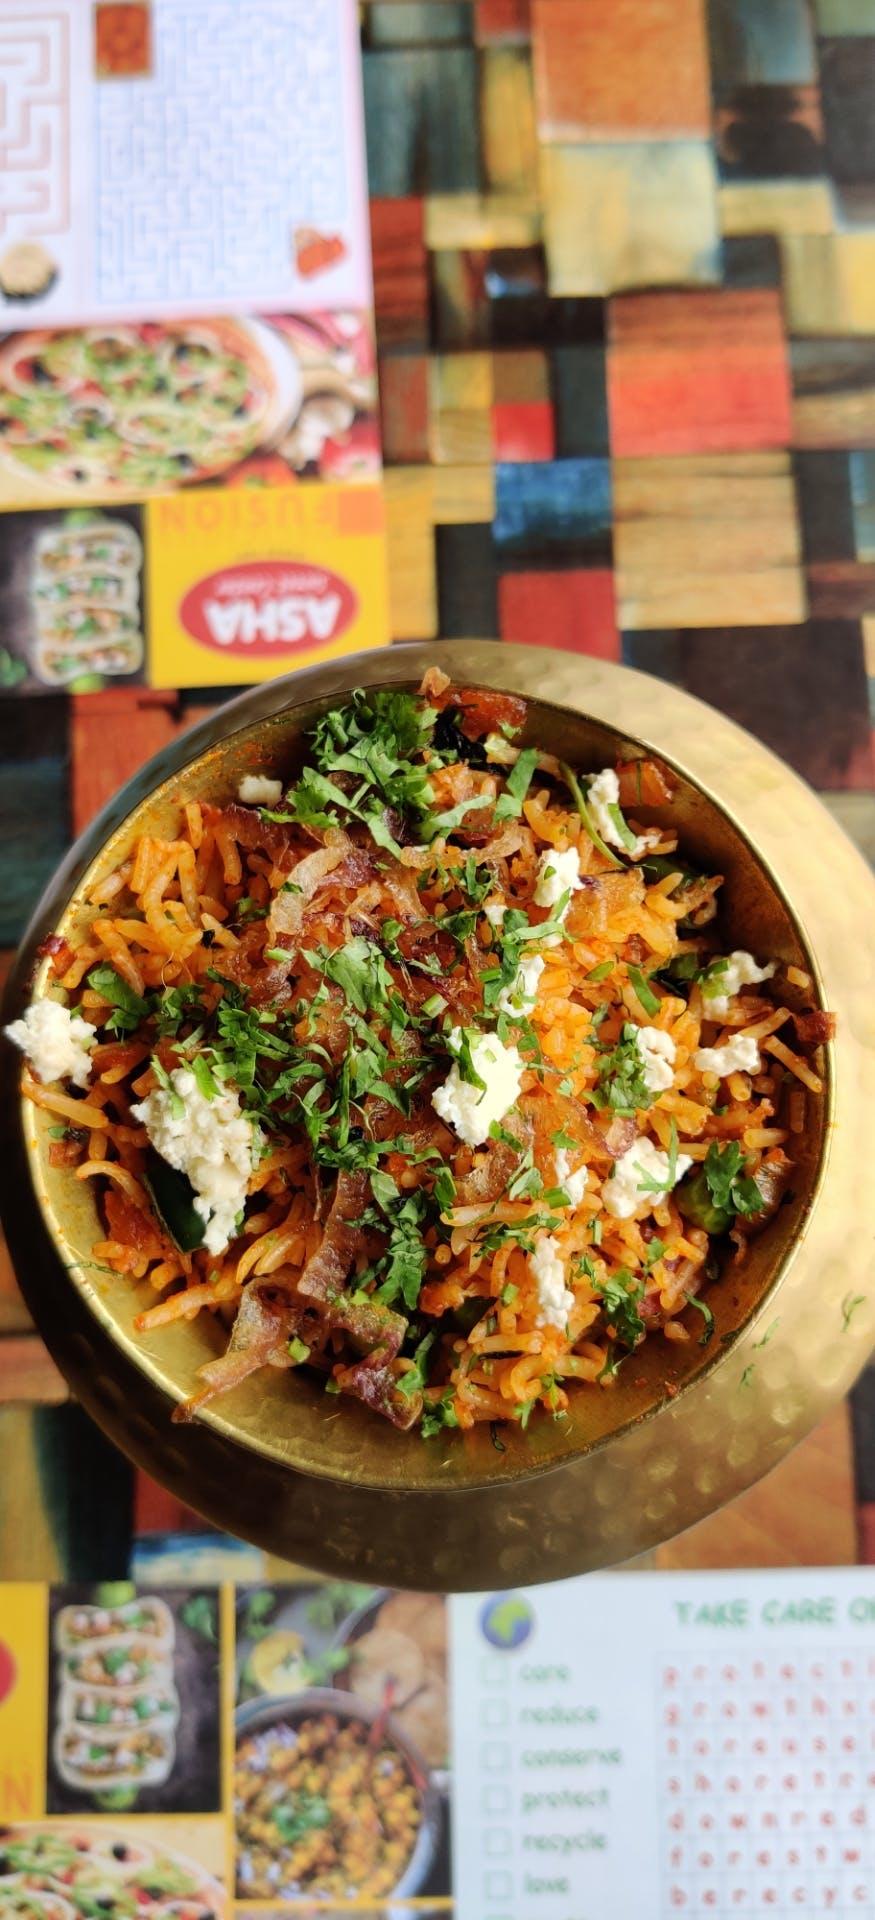 Dish,Cuisine,Food,Biryani,Ingredient,Recipe,Produce,Meat,Side dish,Hyderabadi biriyani